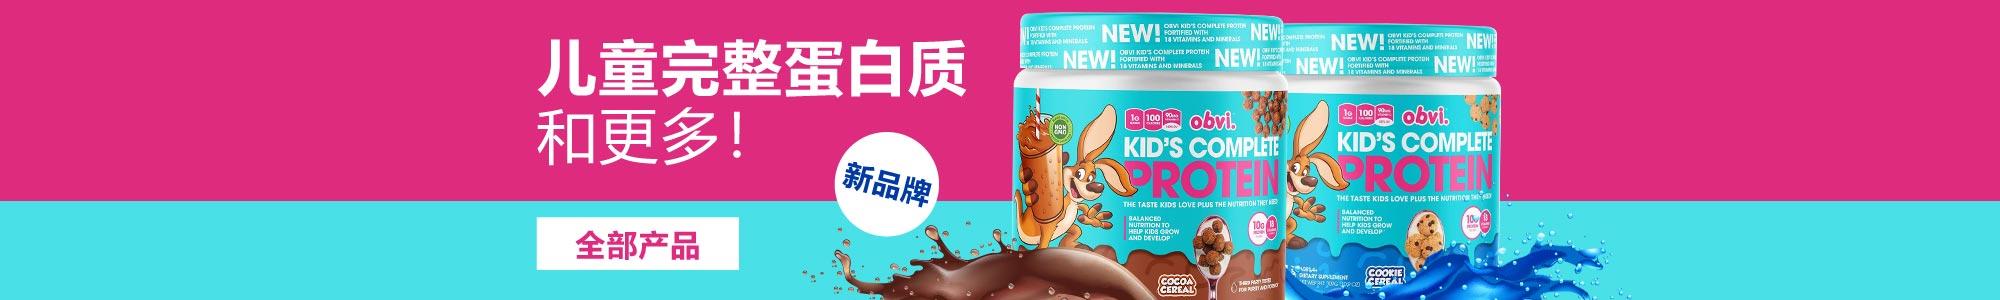 Obvi - 新品牌 儿童完整蛋白质 和更多!全部产品